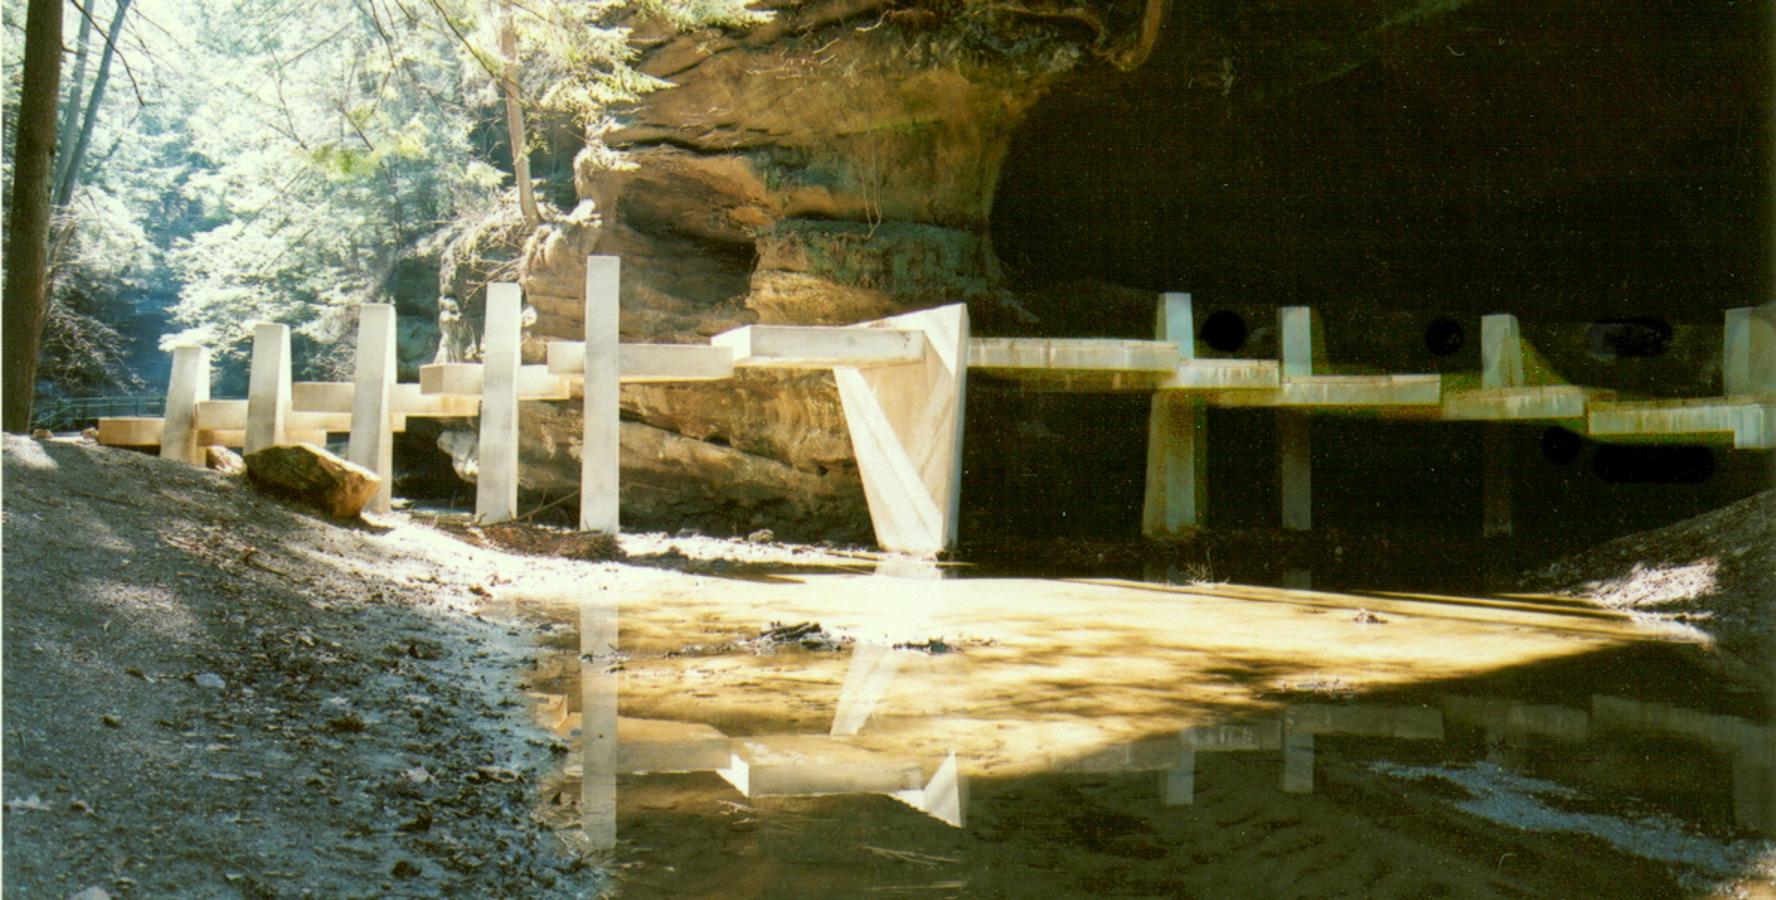 Old Mans Cave at Hocking Hills State Park